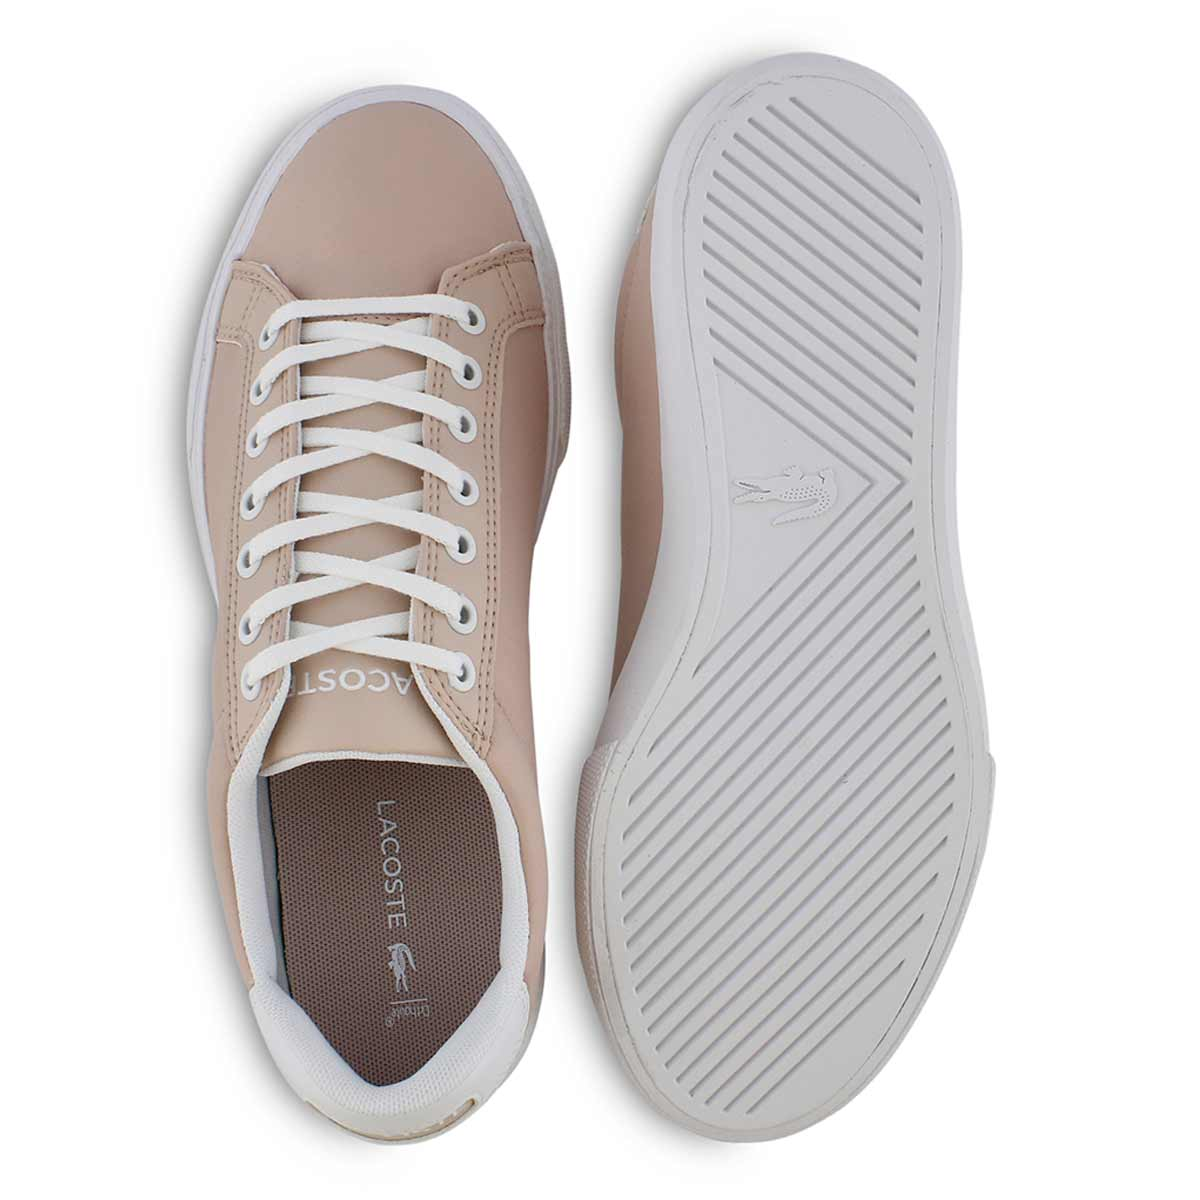 Lds Grad Vulc 119 2 P pnk/wht sneaker